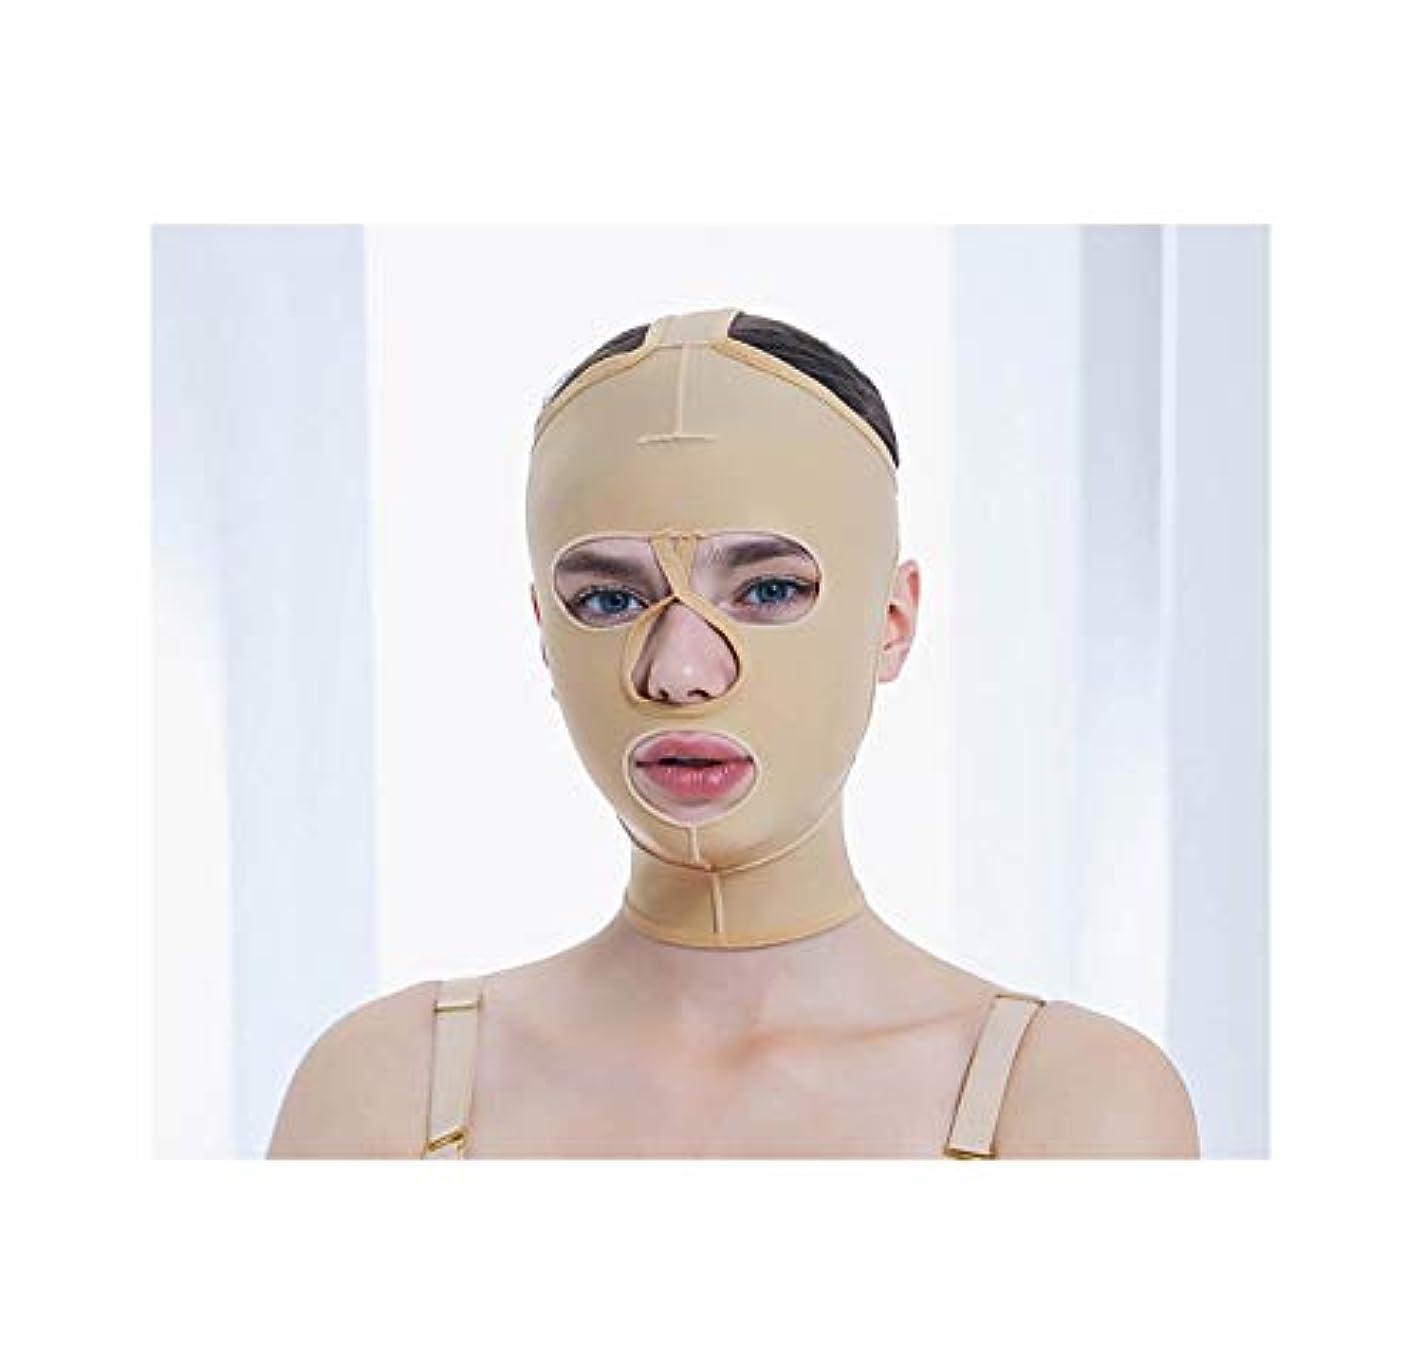 GLJJQMY 顔と首のリフト痩身マスク脂肪吸引術脂肪吸引整形マスクフードフェイシャルリフティングアーティファクトVフェイスビーム弾性スリーブ 顔用整形マスク (Size : XXL)